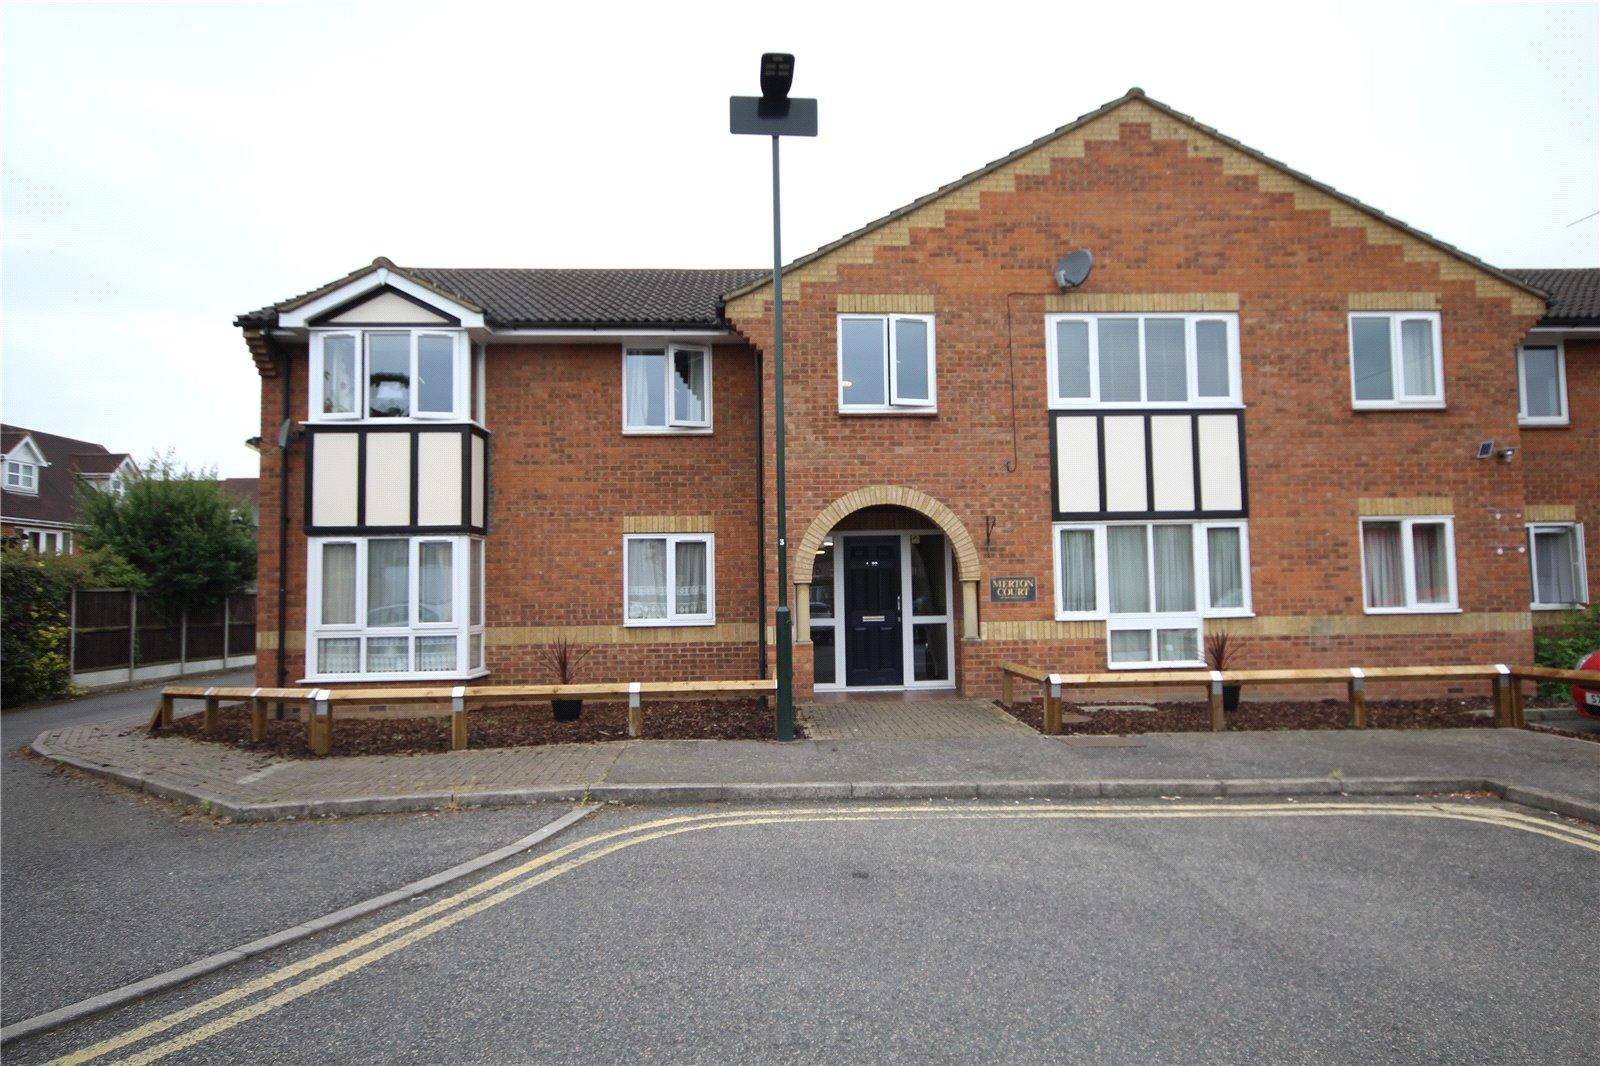 Merton Court, Church Road, Welling, Kent, DA16